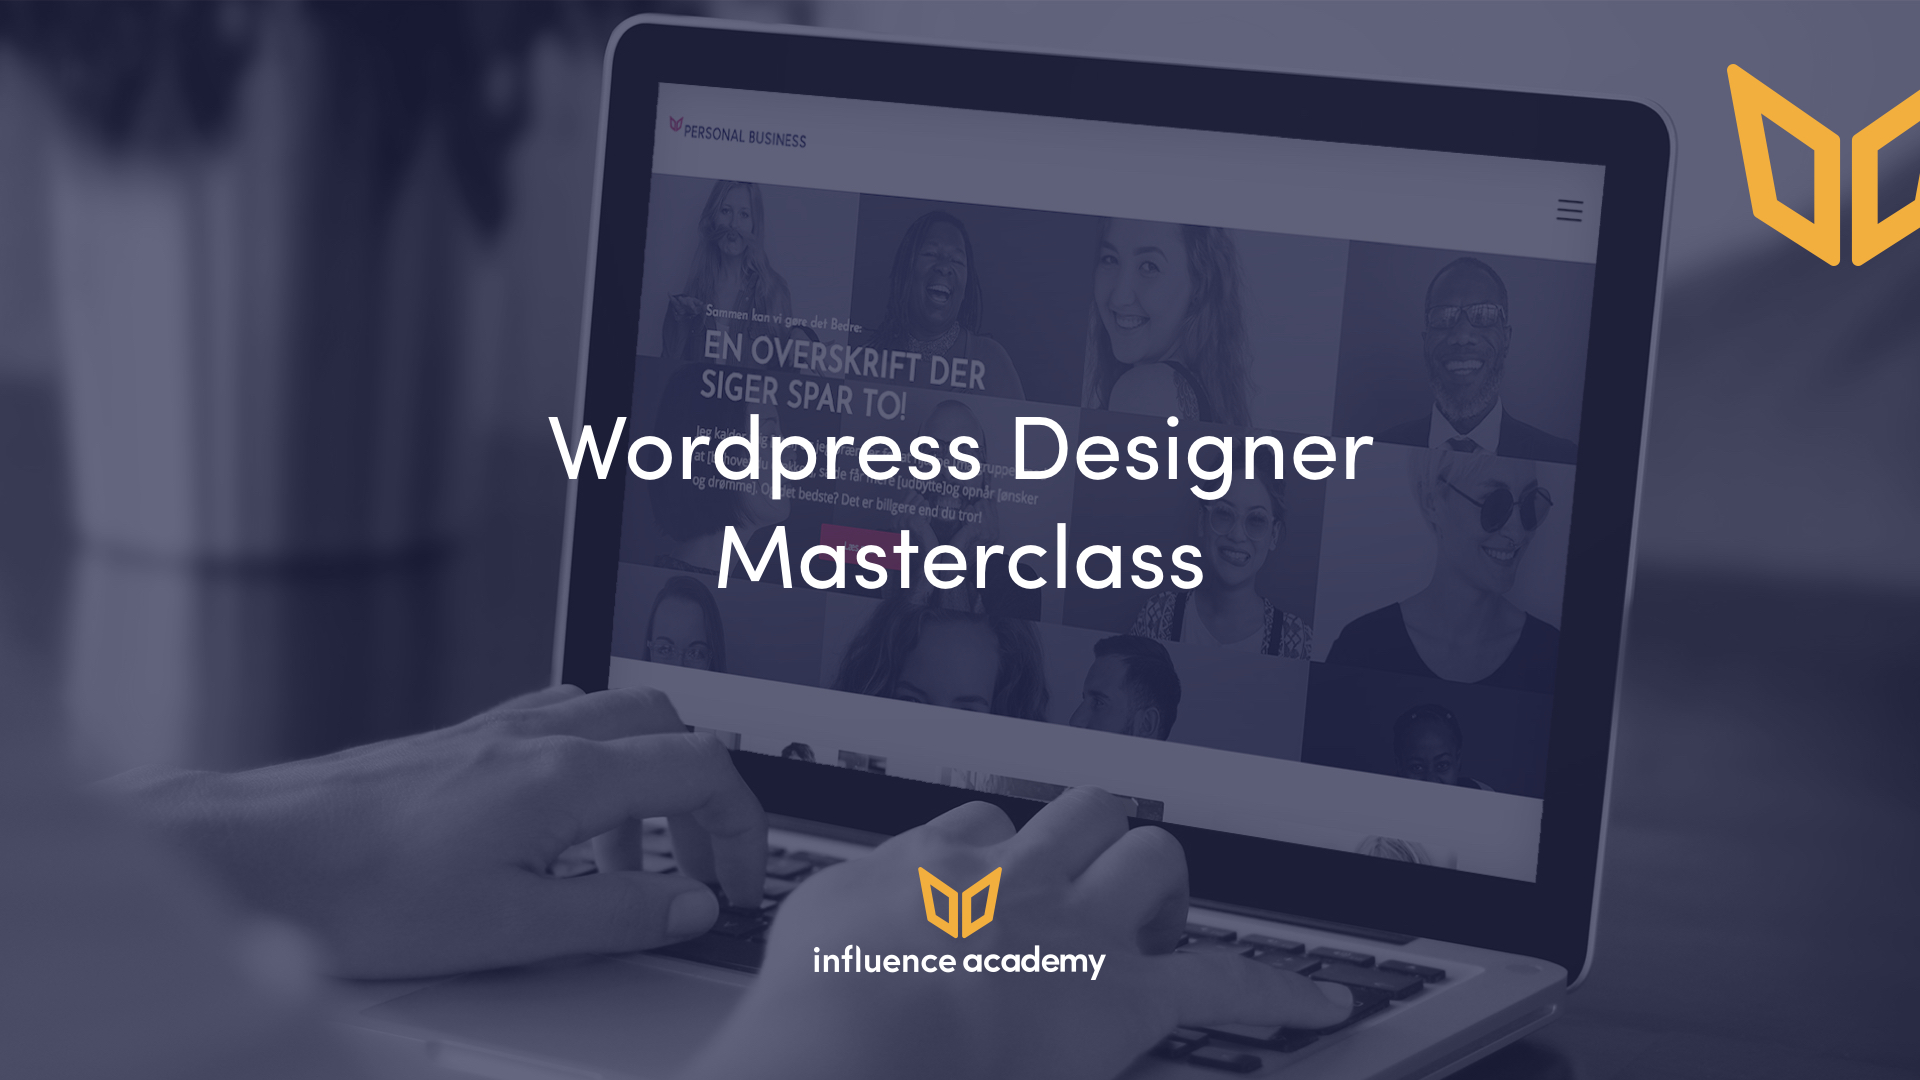 Wordpress Designer Masterclass